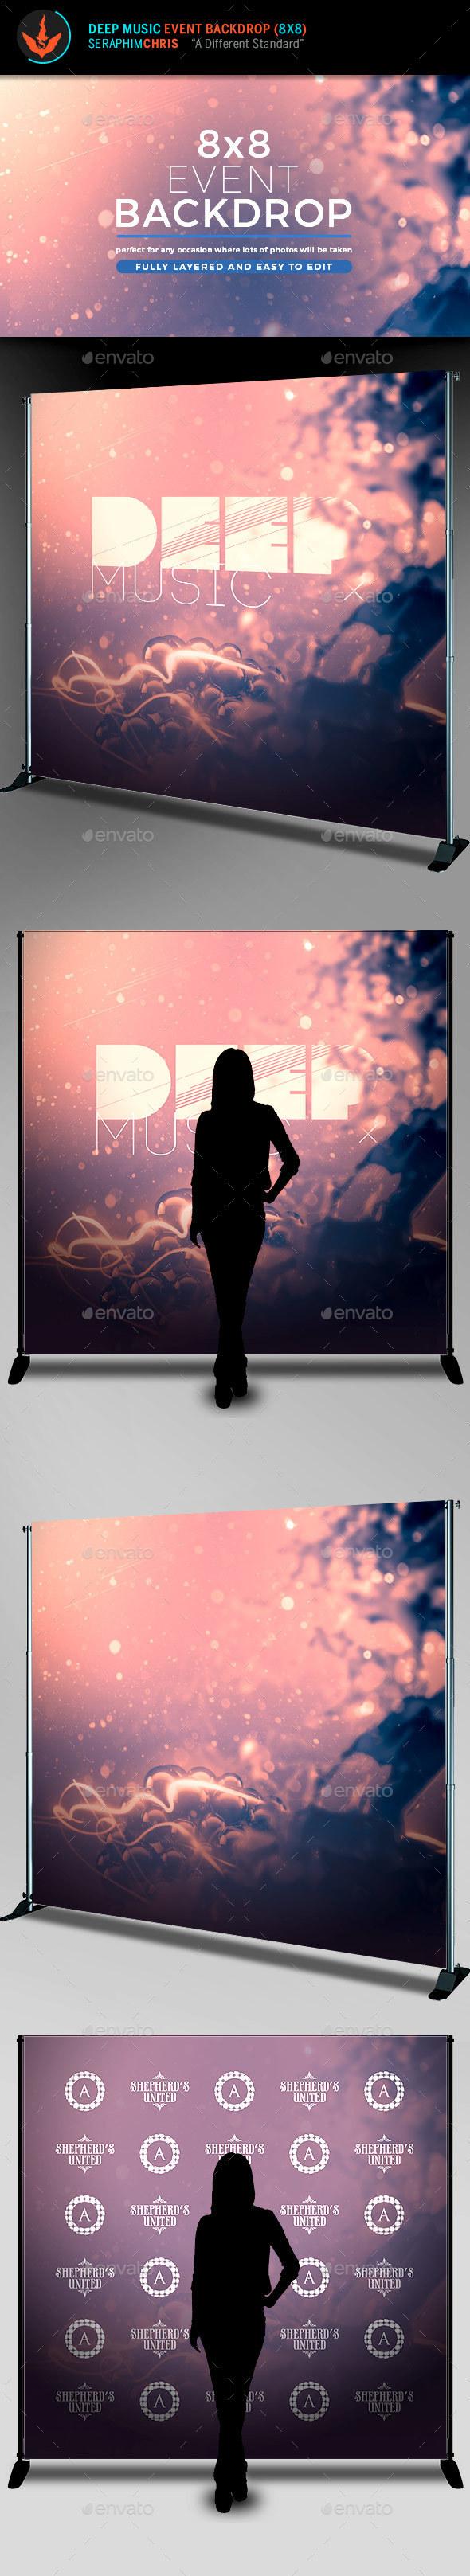 Deep Music Event Backdrop Template - Signage Print Templates